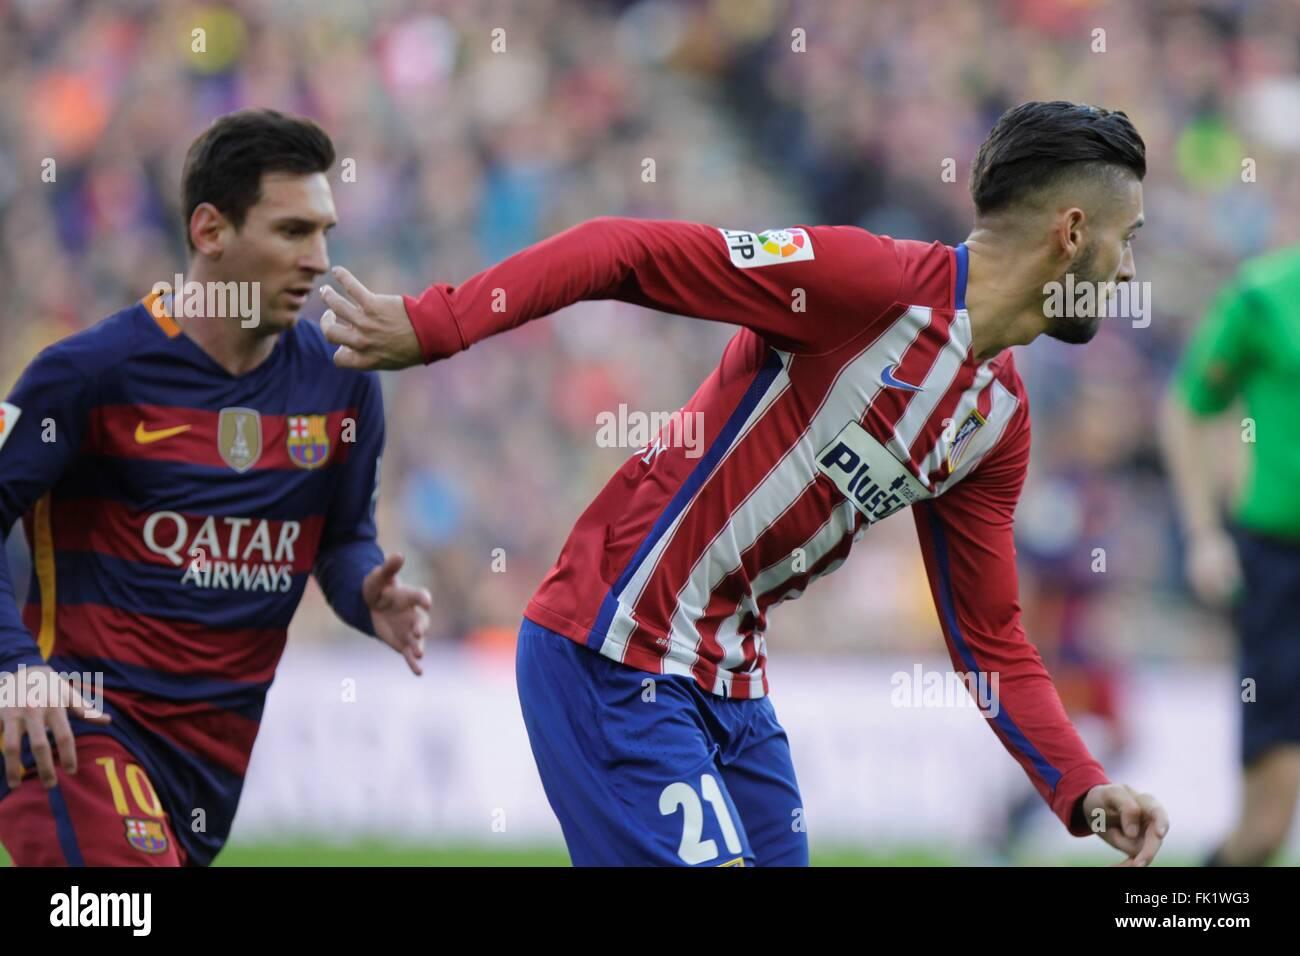 Yannick Carrasco in action during the La Liga match FC Barcelona